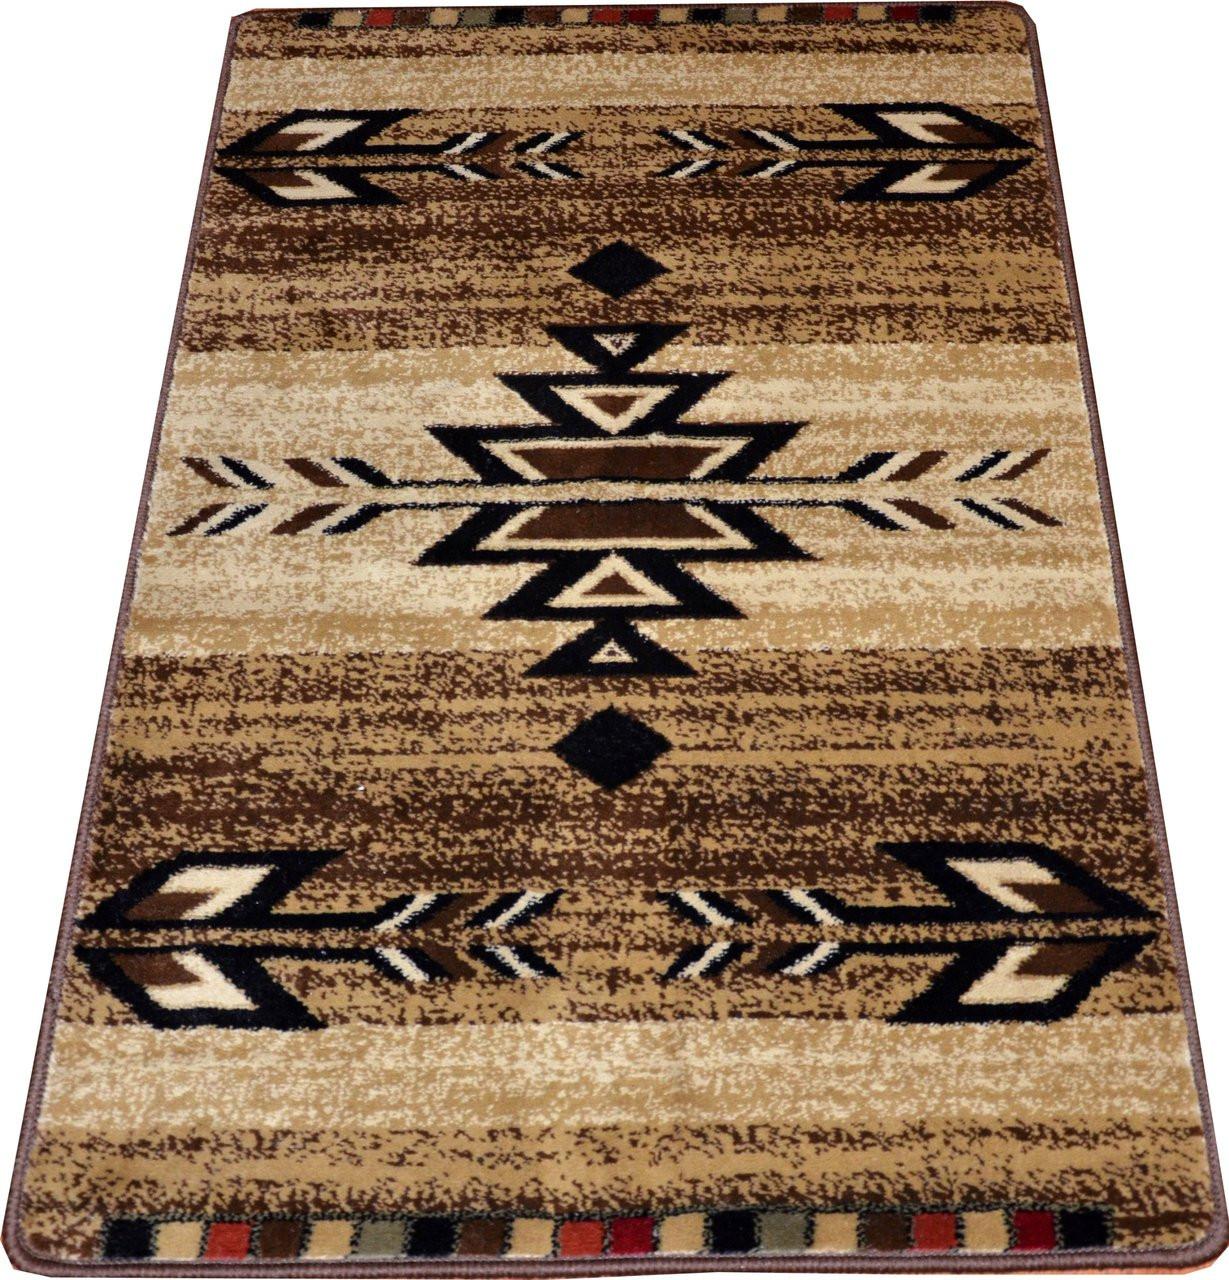 Dean Santa Fe Beige Carpet Rug Runner Mat 50 Quot X 31 Quot